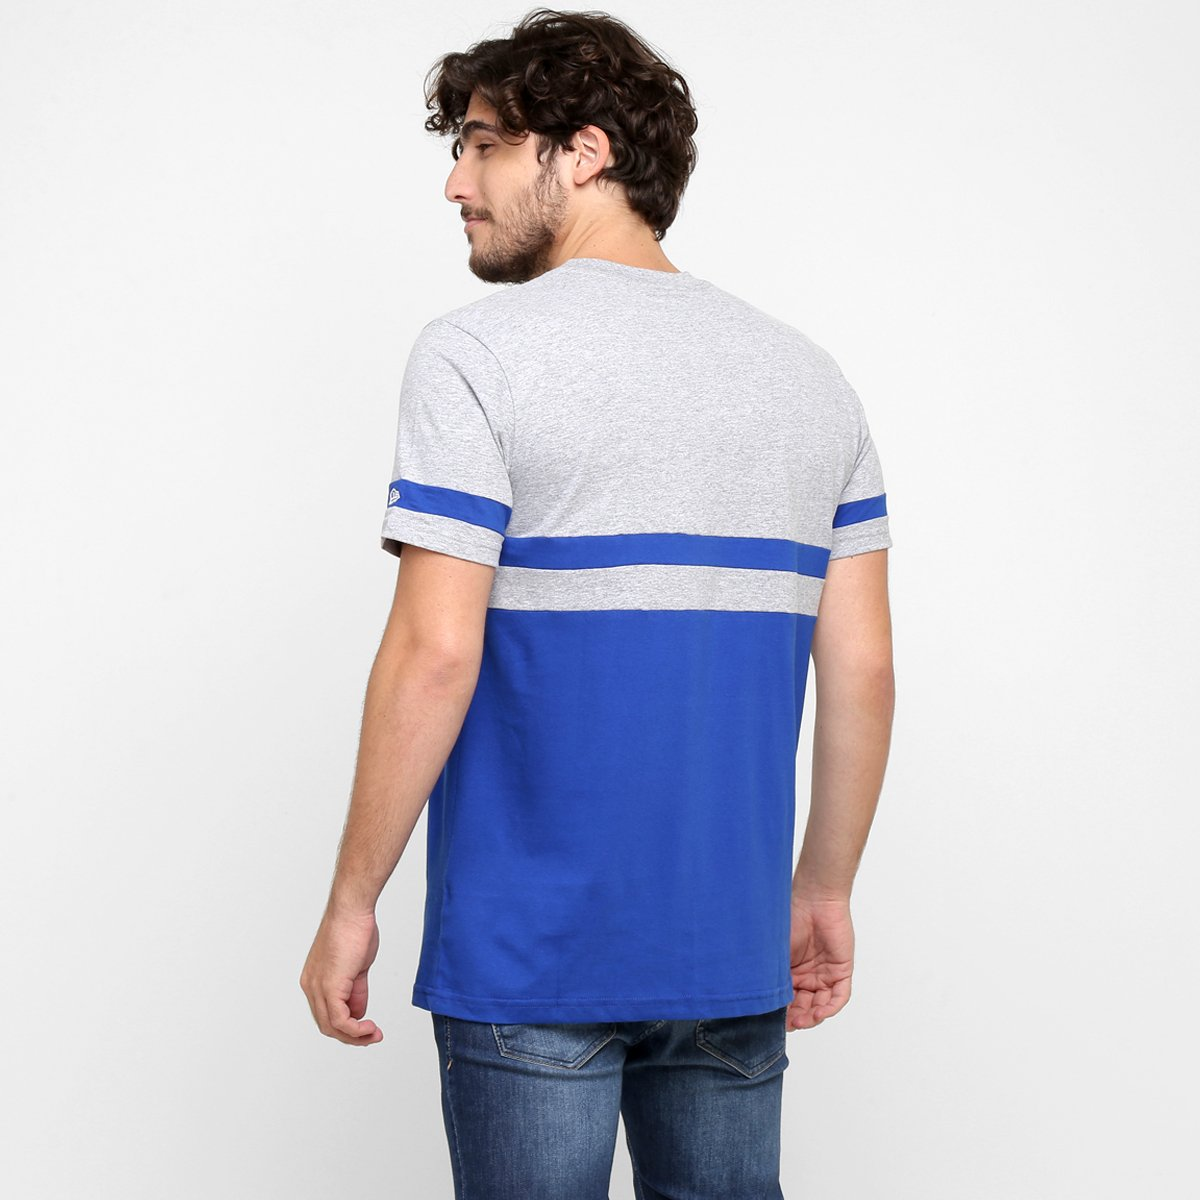 Camiseta New Era NFL Ribbon New York Giants - Compre Agora  74236f24f2238